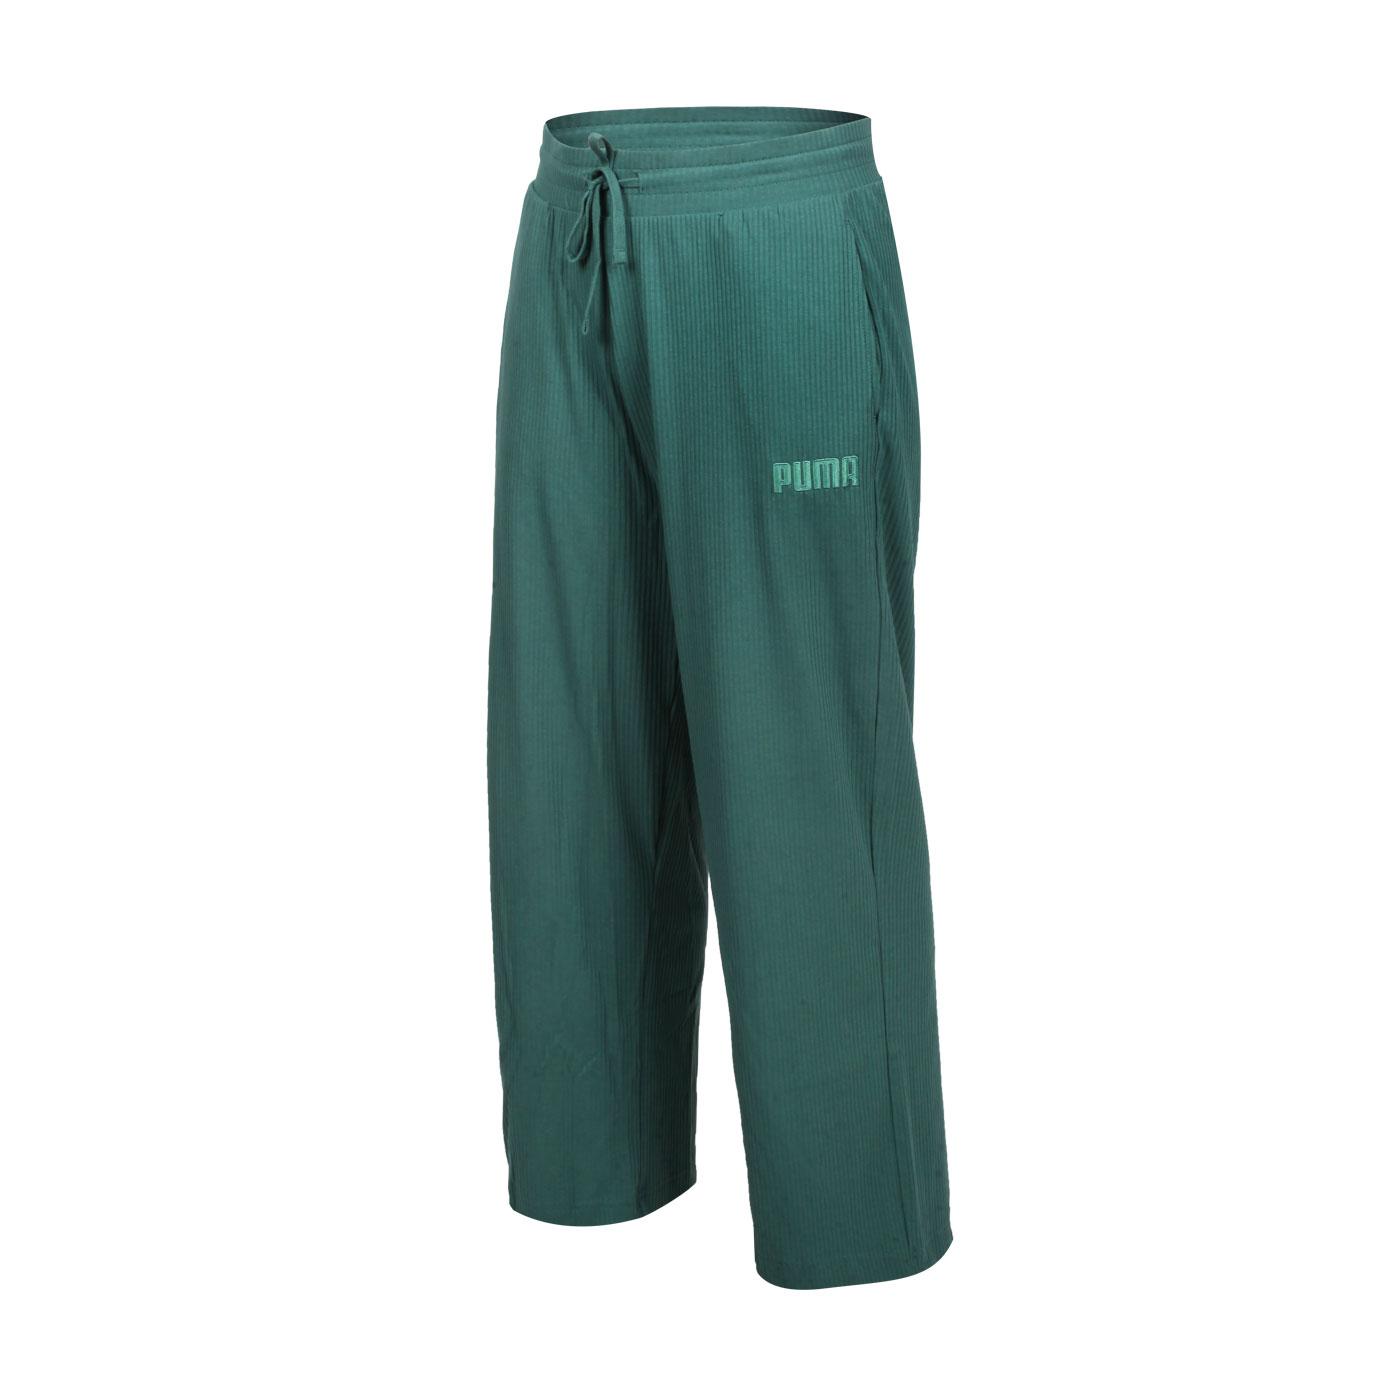 PUMA 女款基本系列Modern Basics羅紋寬褲 58593845 - 綠